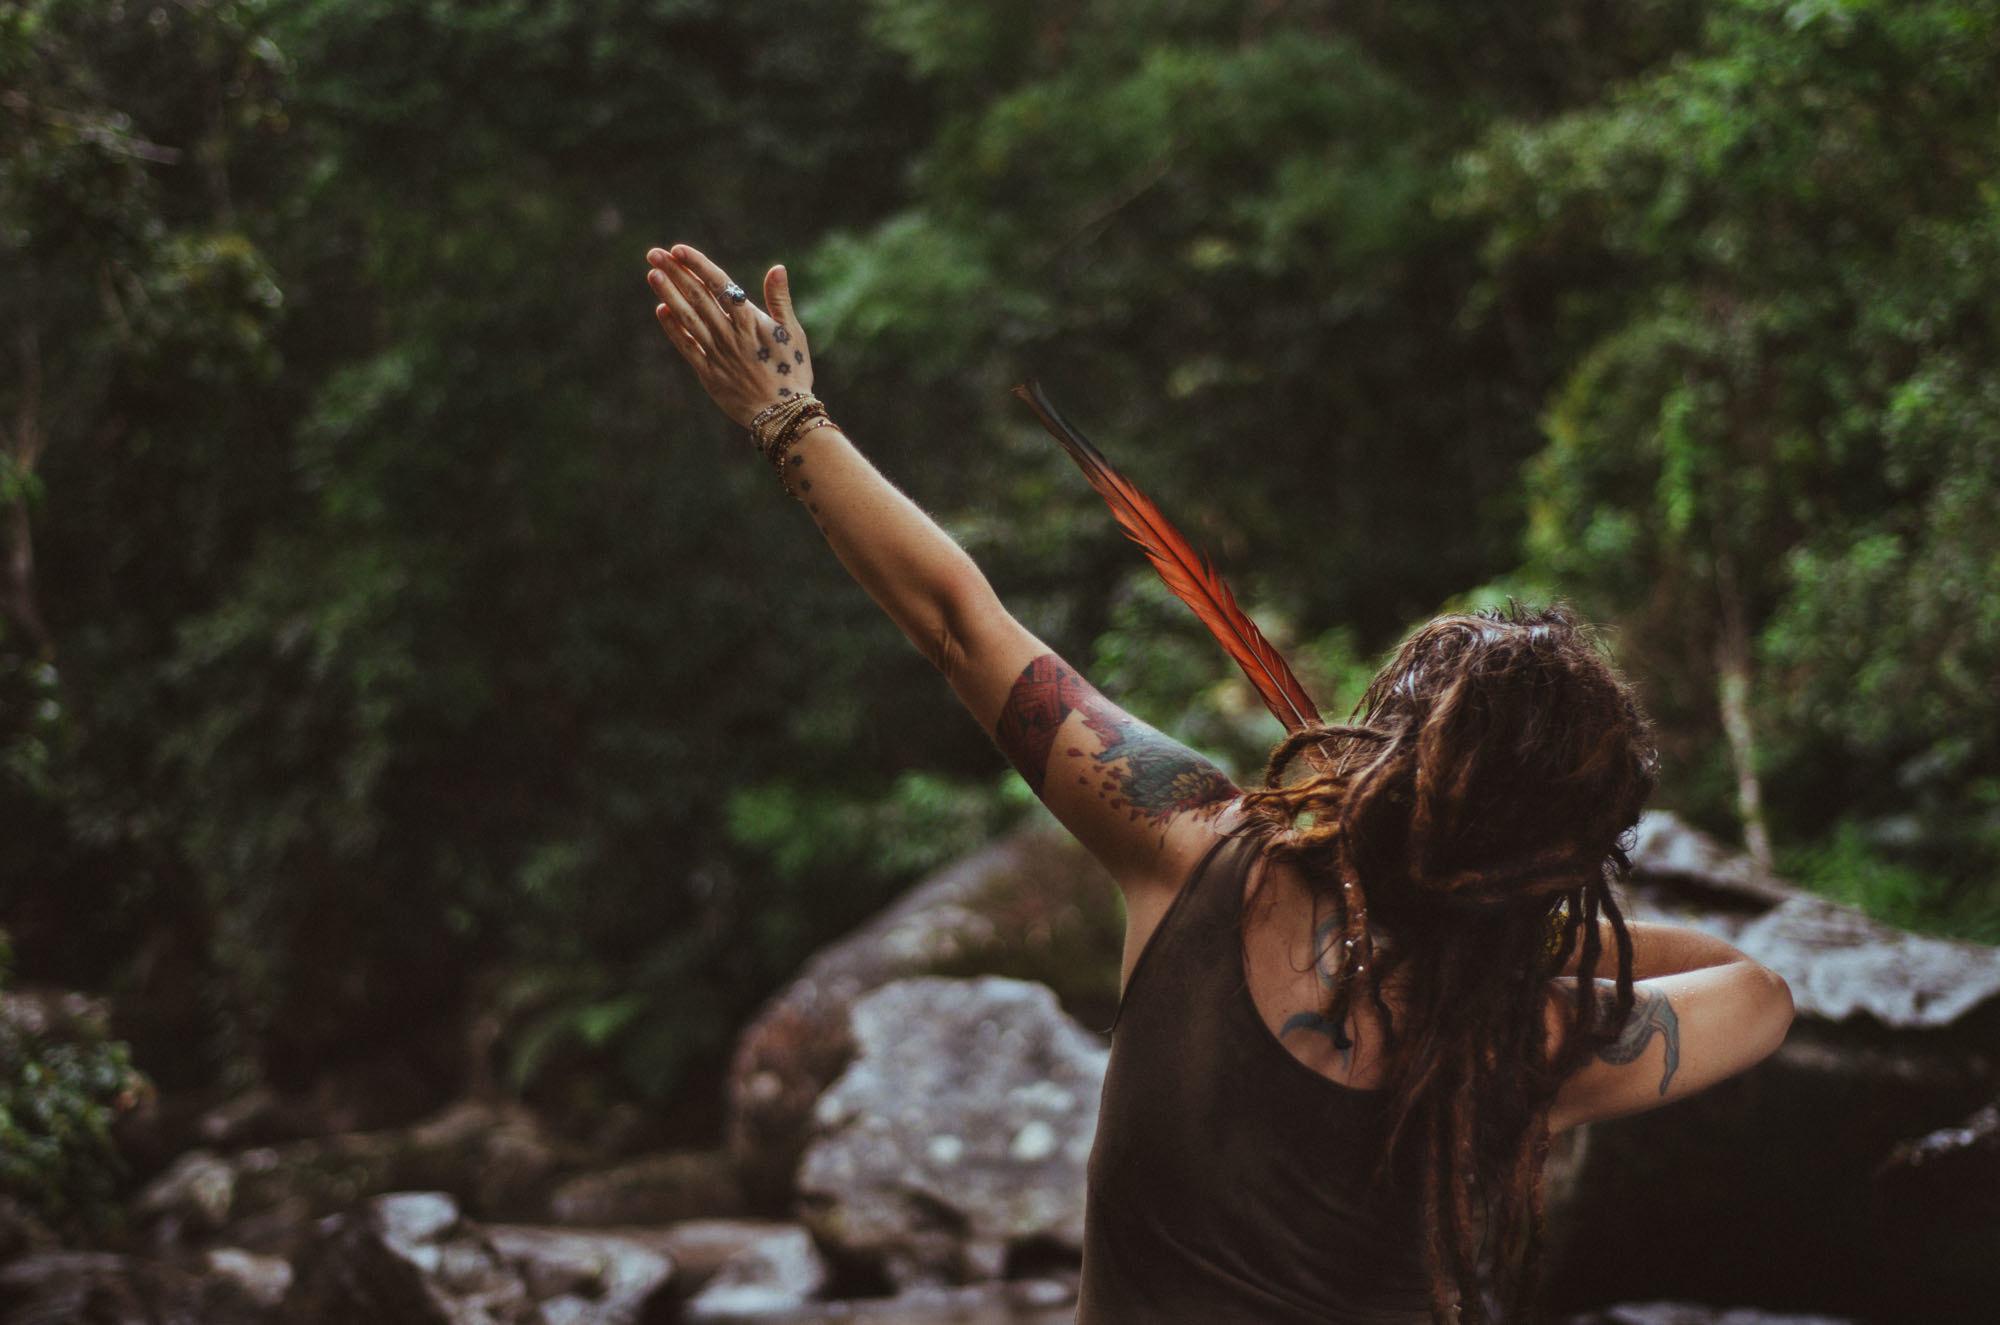 cachoeira-prumirim-ubatuba-set-16-177